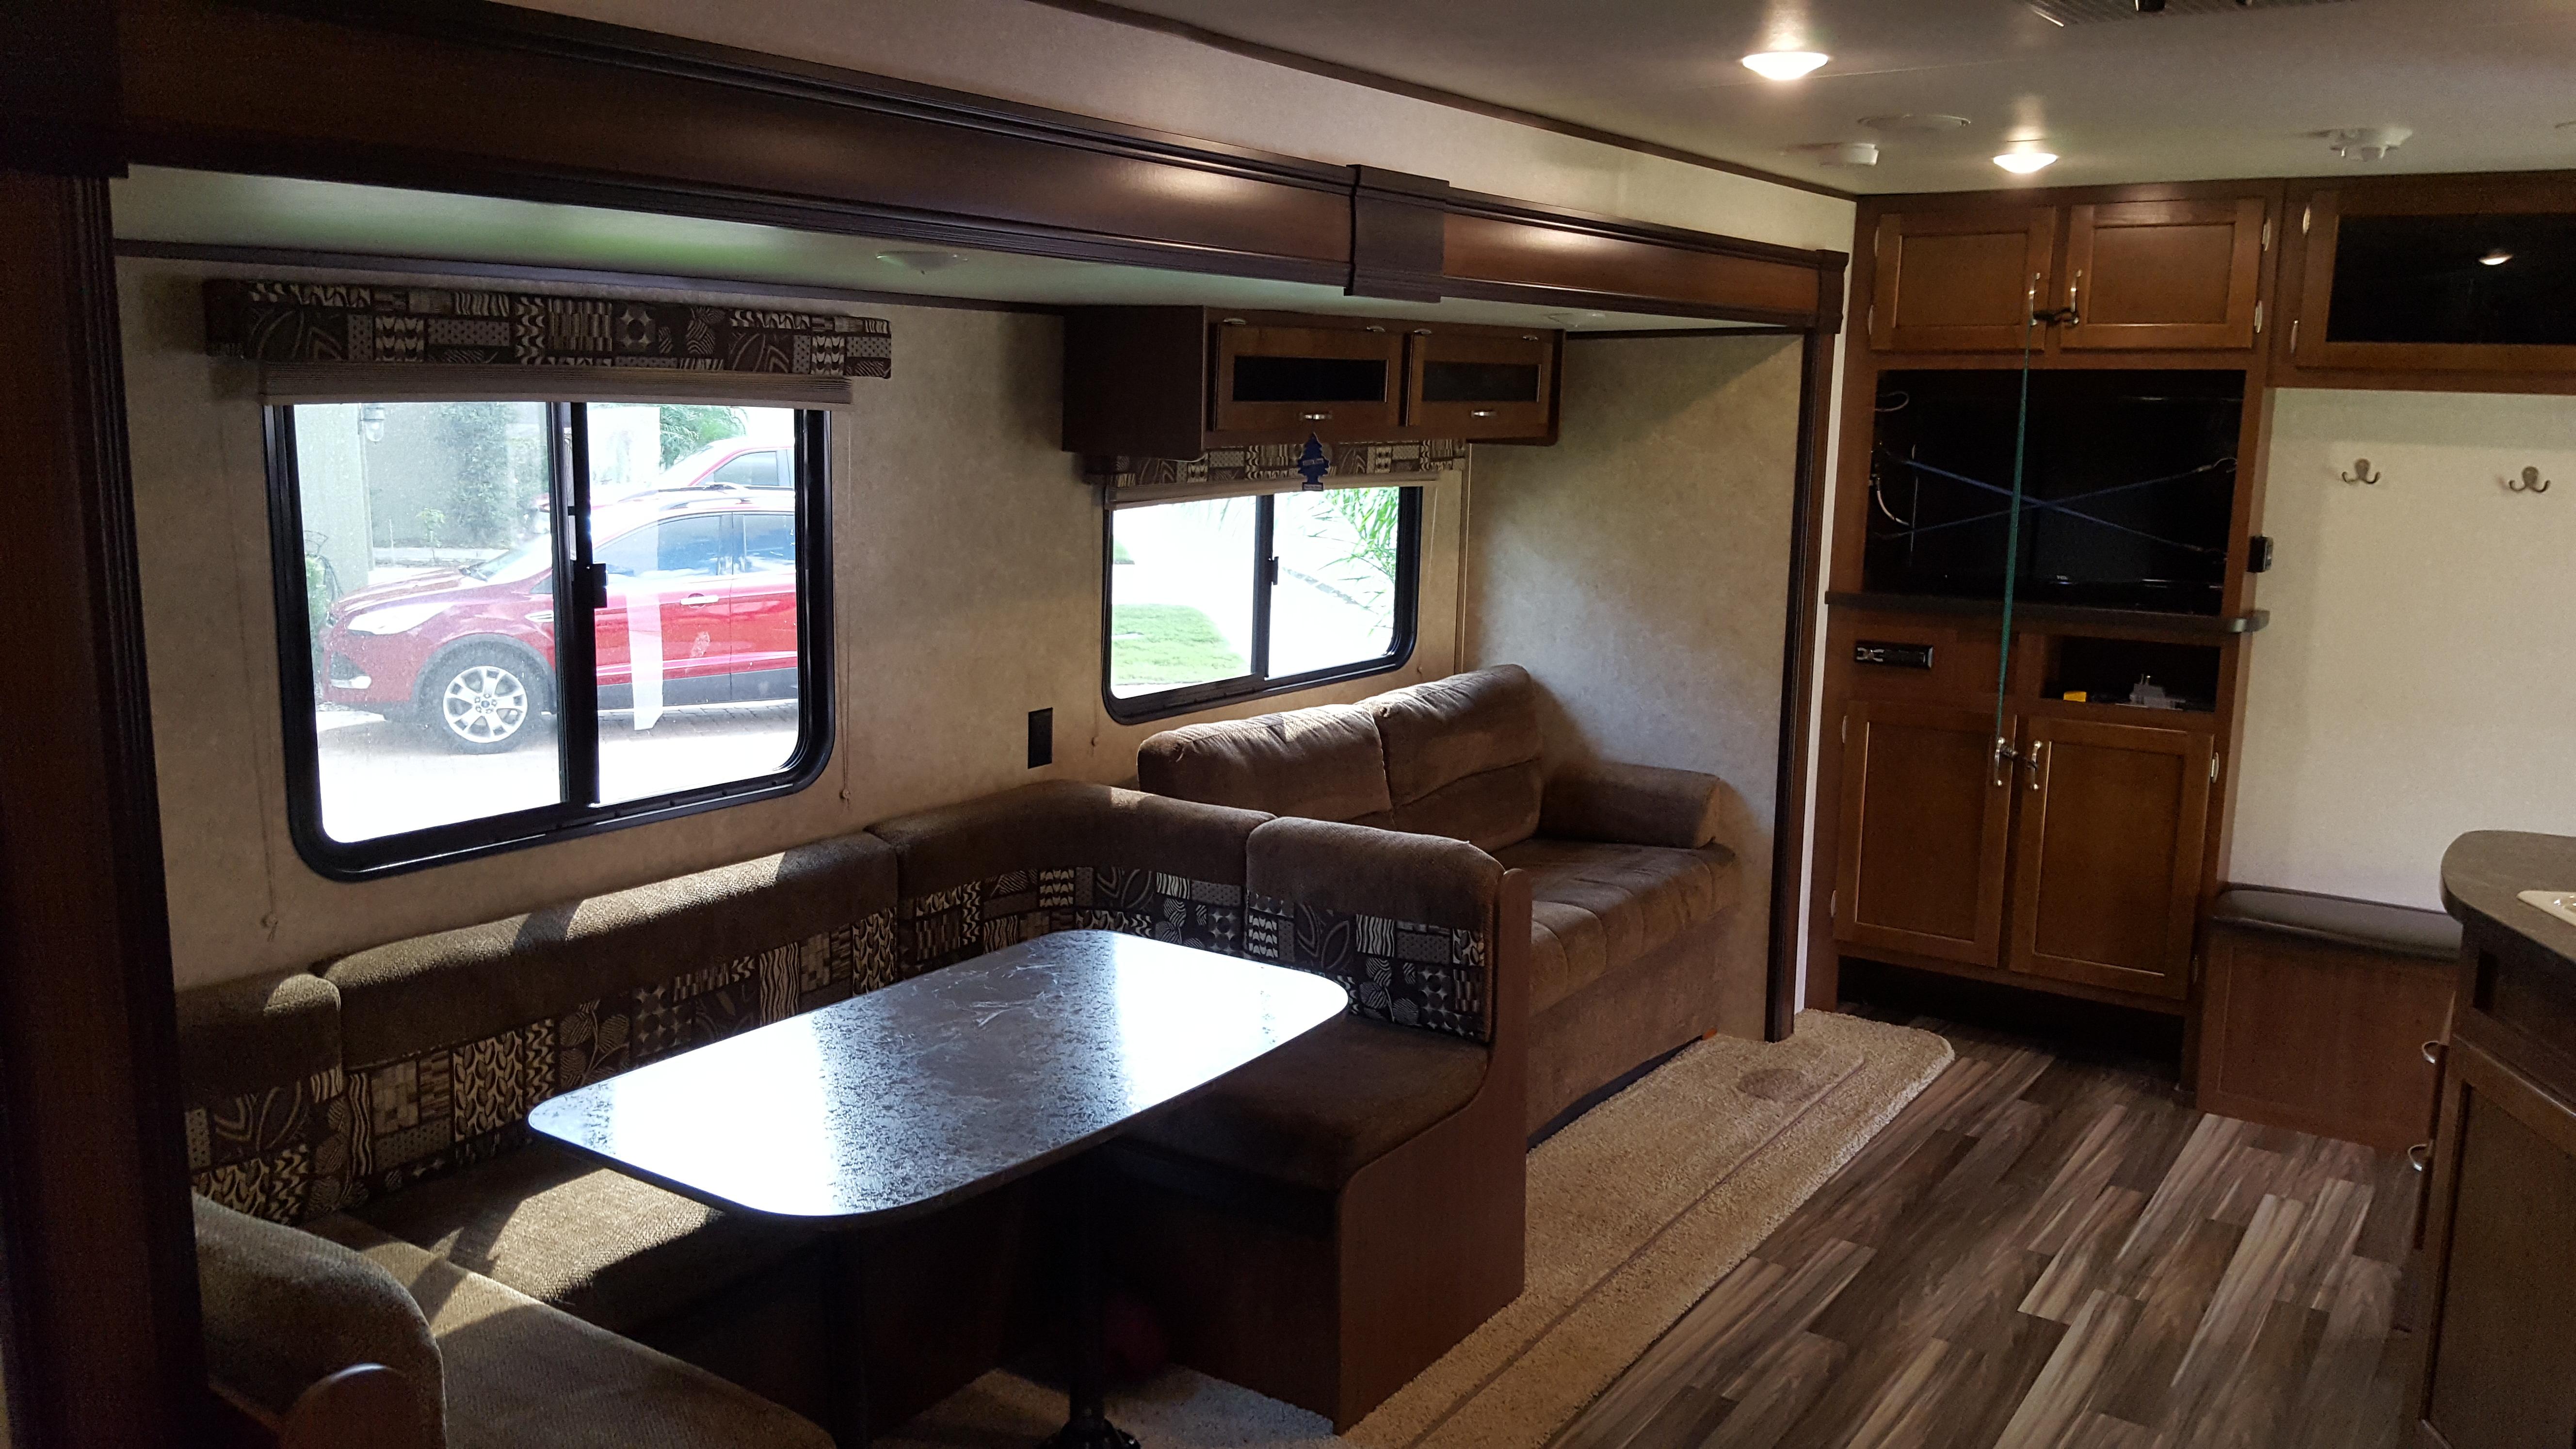 Kitchenette & Sofa bed. Jayco Jay Flight SLX 287 BHSW 2017